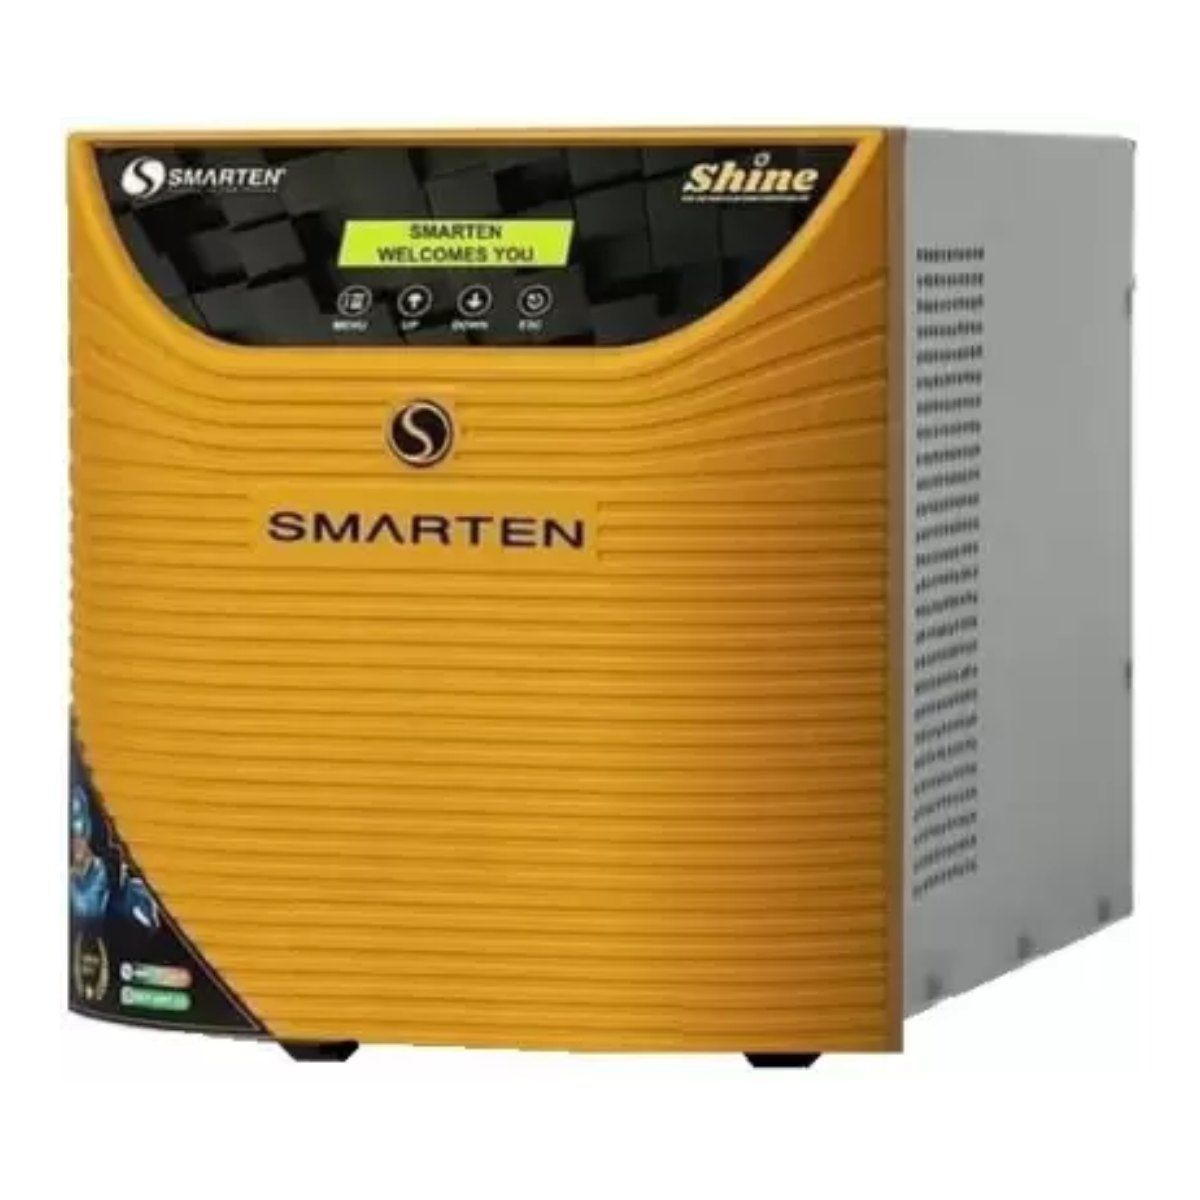 Smarten SHINE SOLAR PCU Pure Sine Wave Inverter